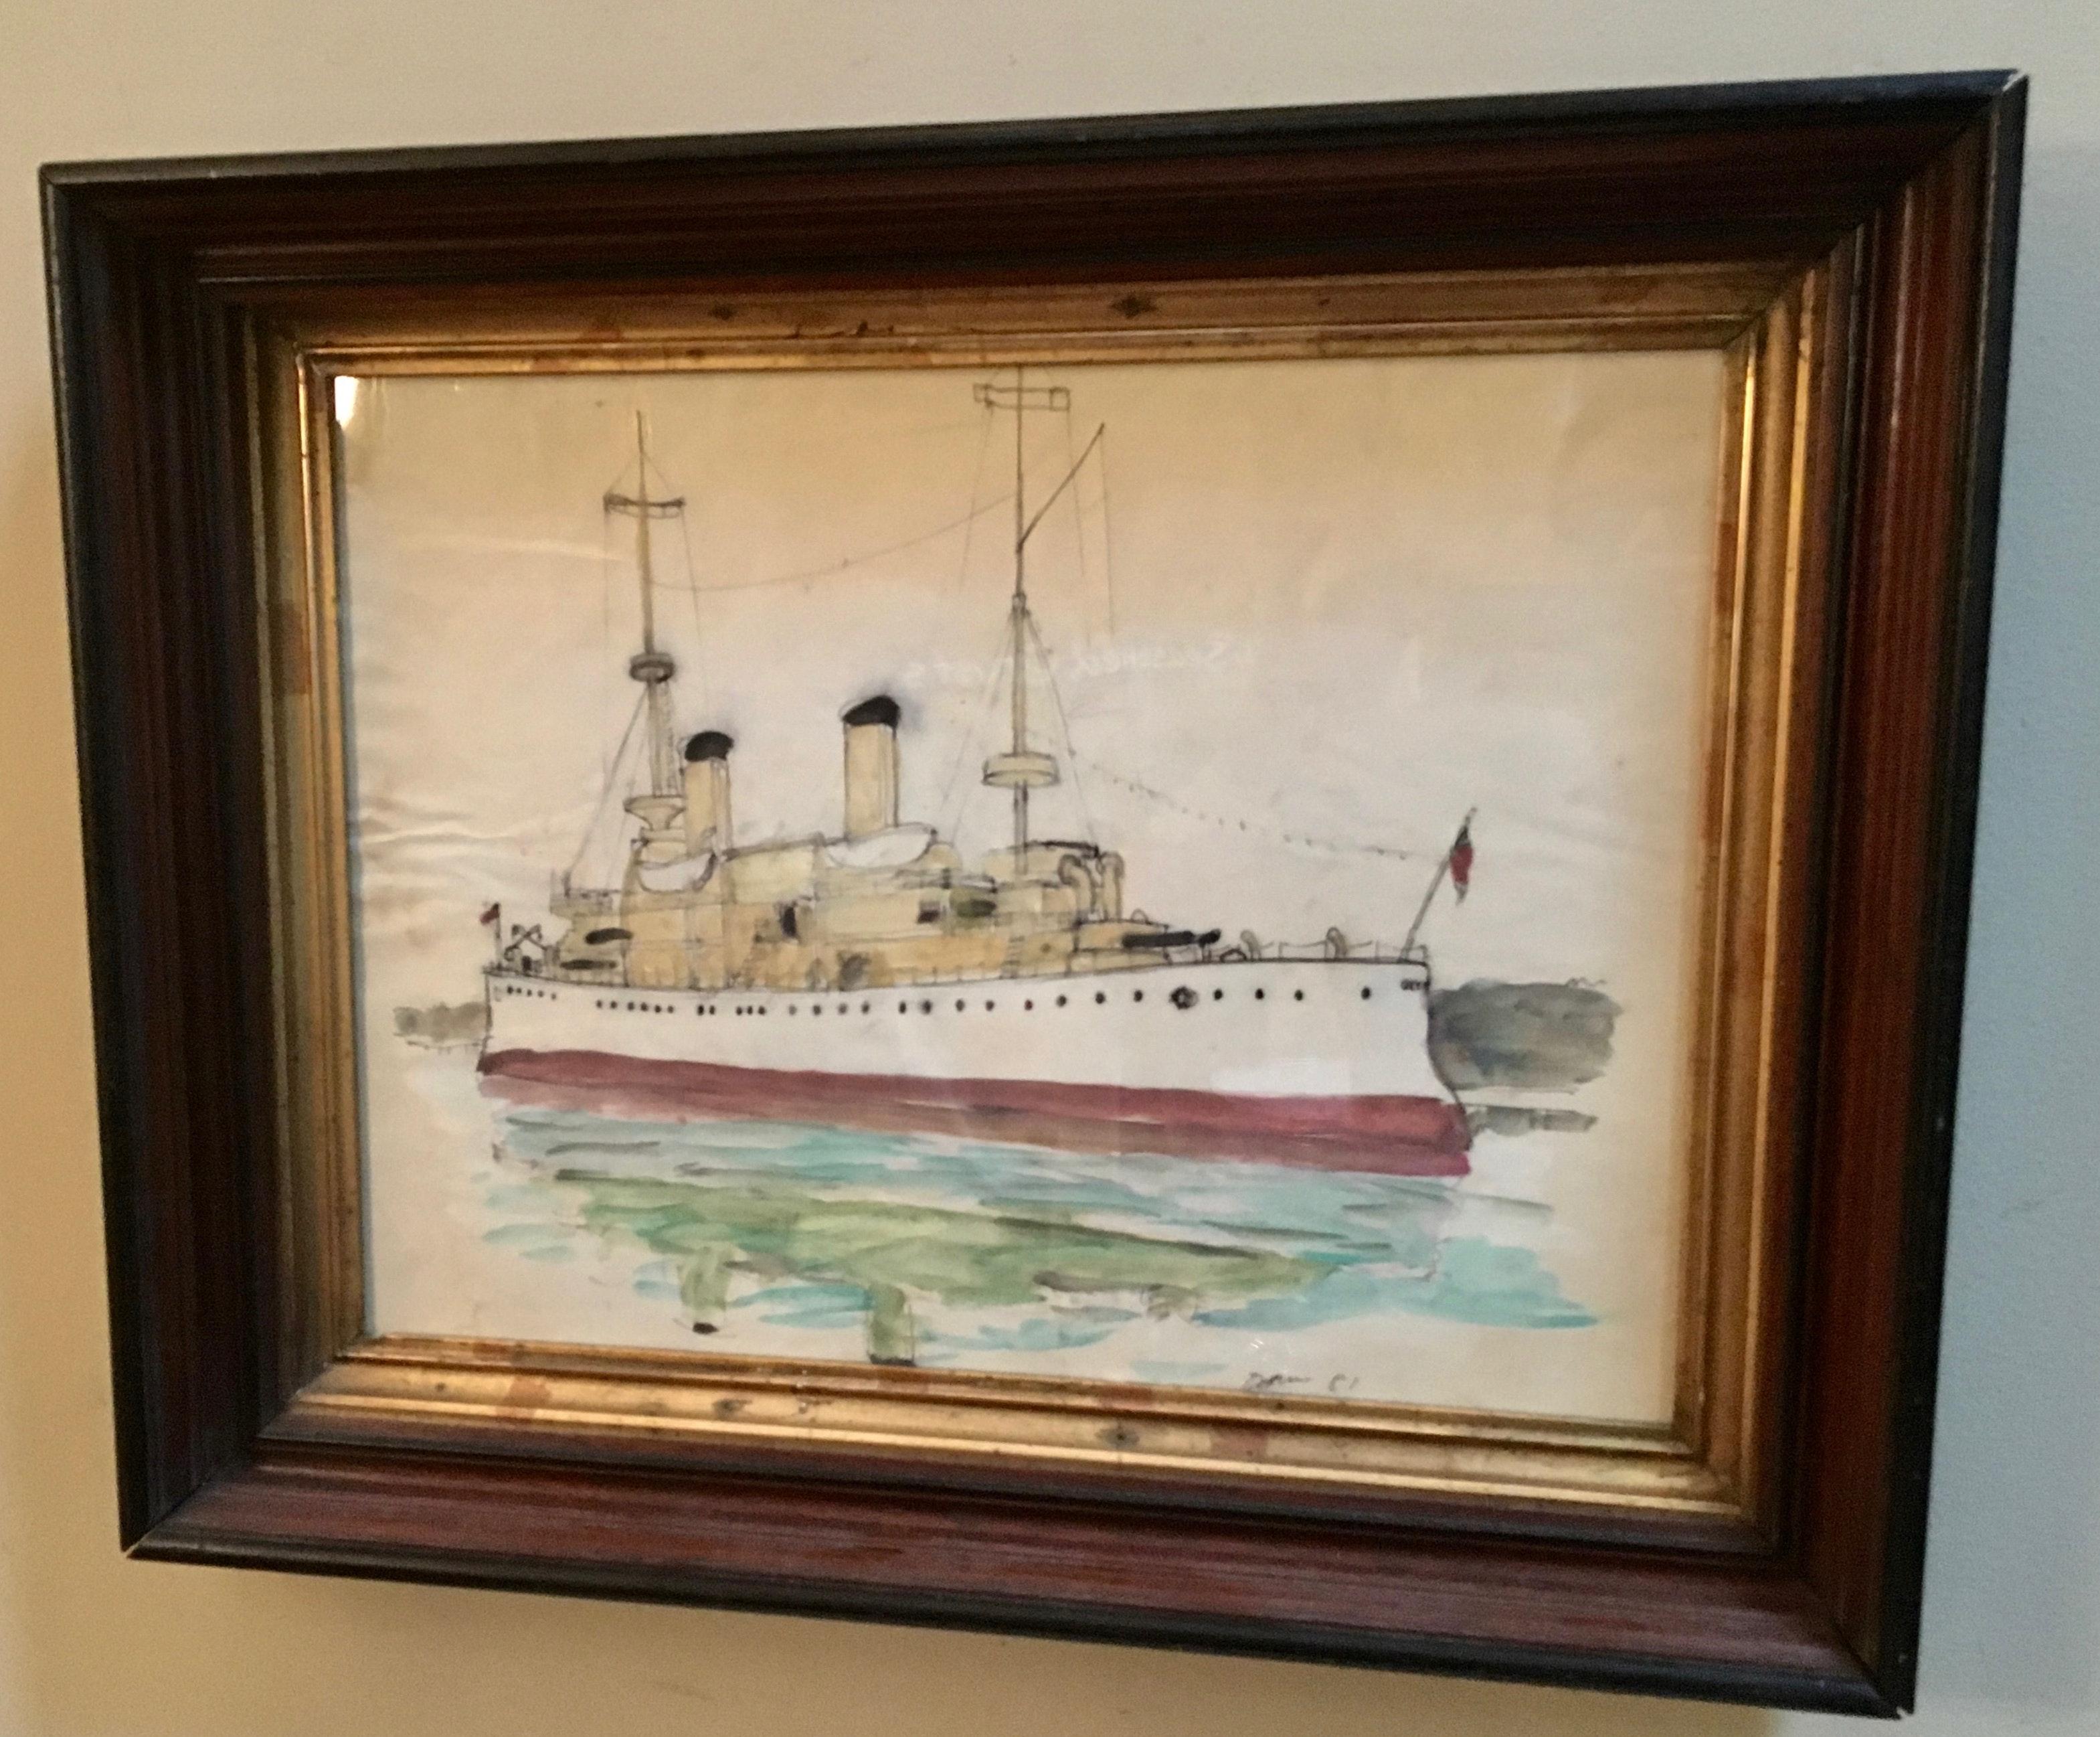 Watercolor Painting of Steamship in Vintage Walnut Frame